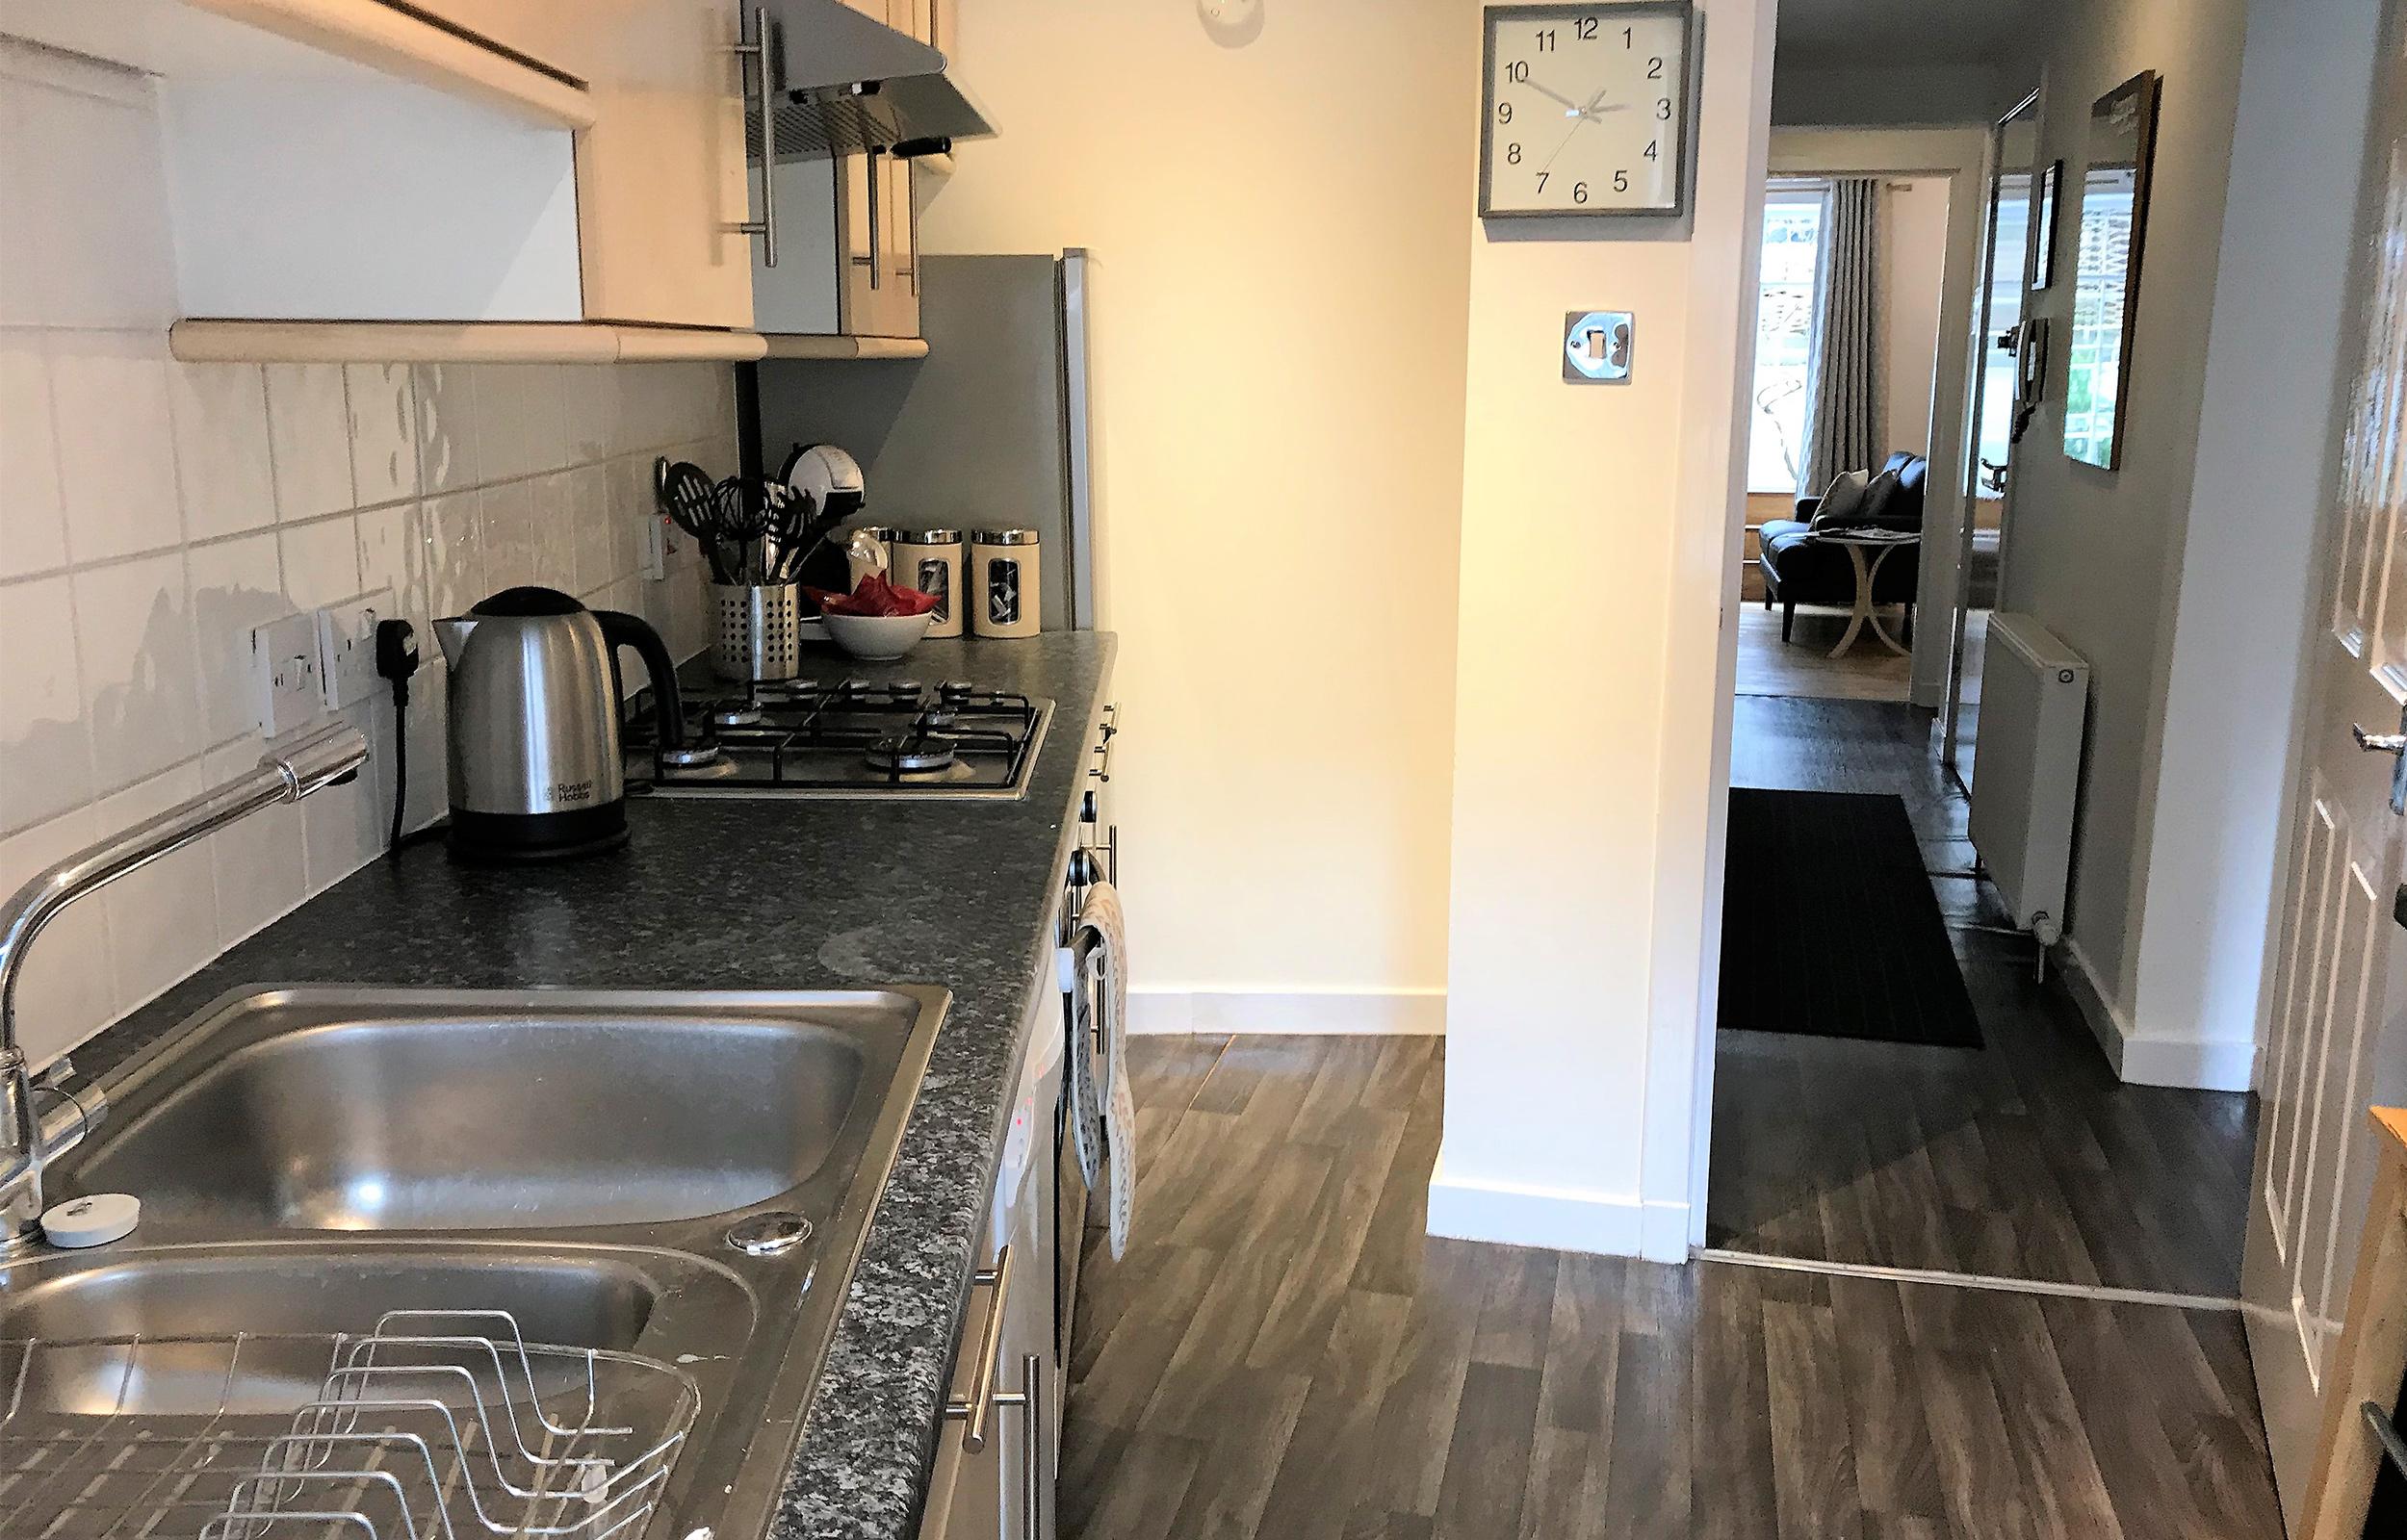 Equipped kitchen at Lansdowne Garden Apartment - Citybase Apartments